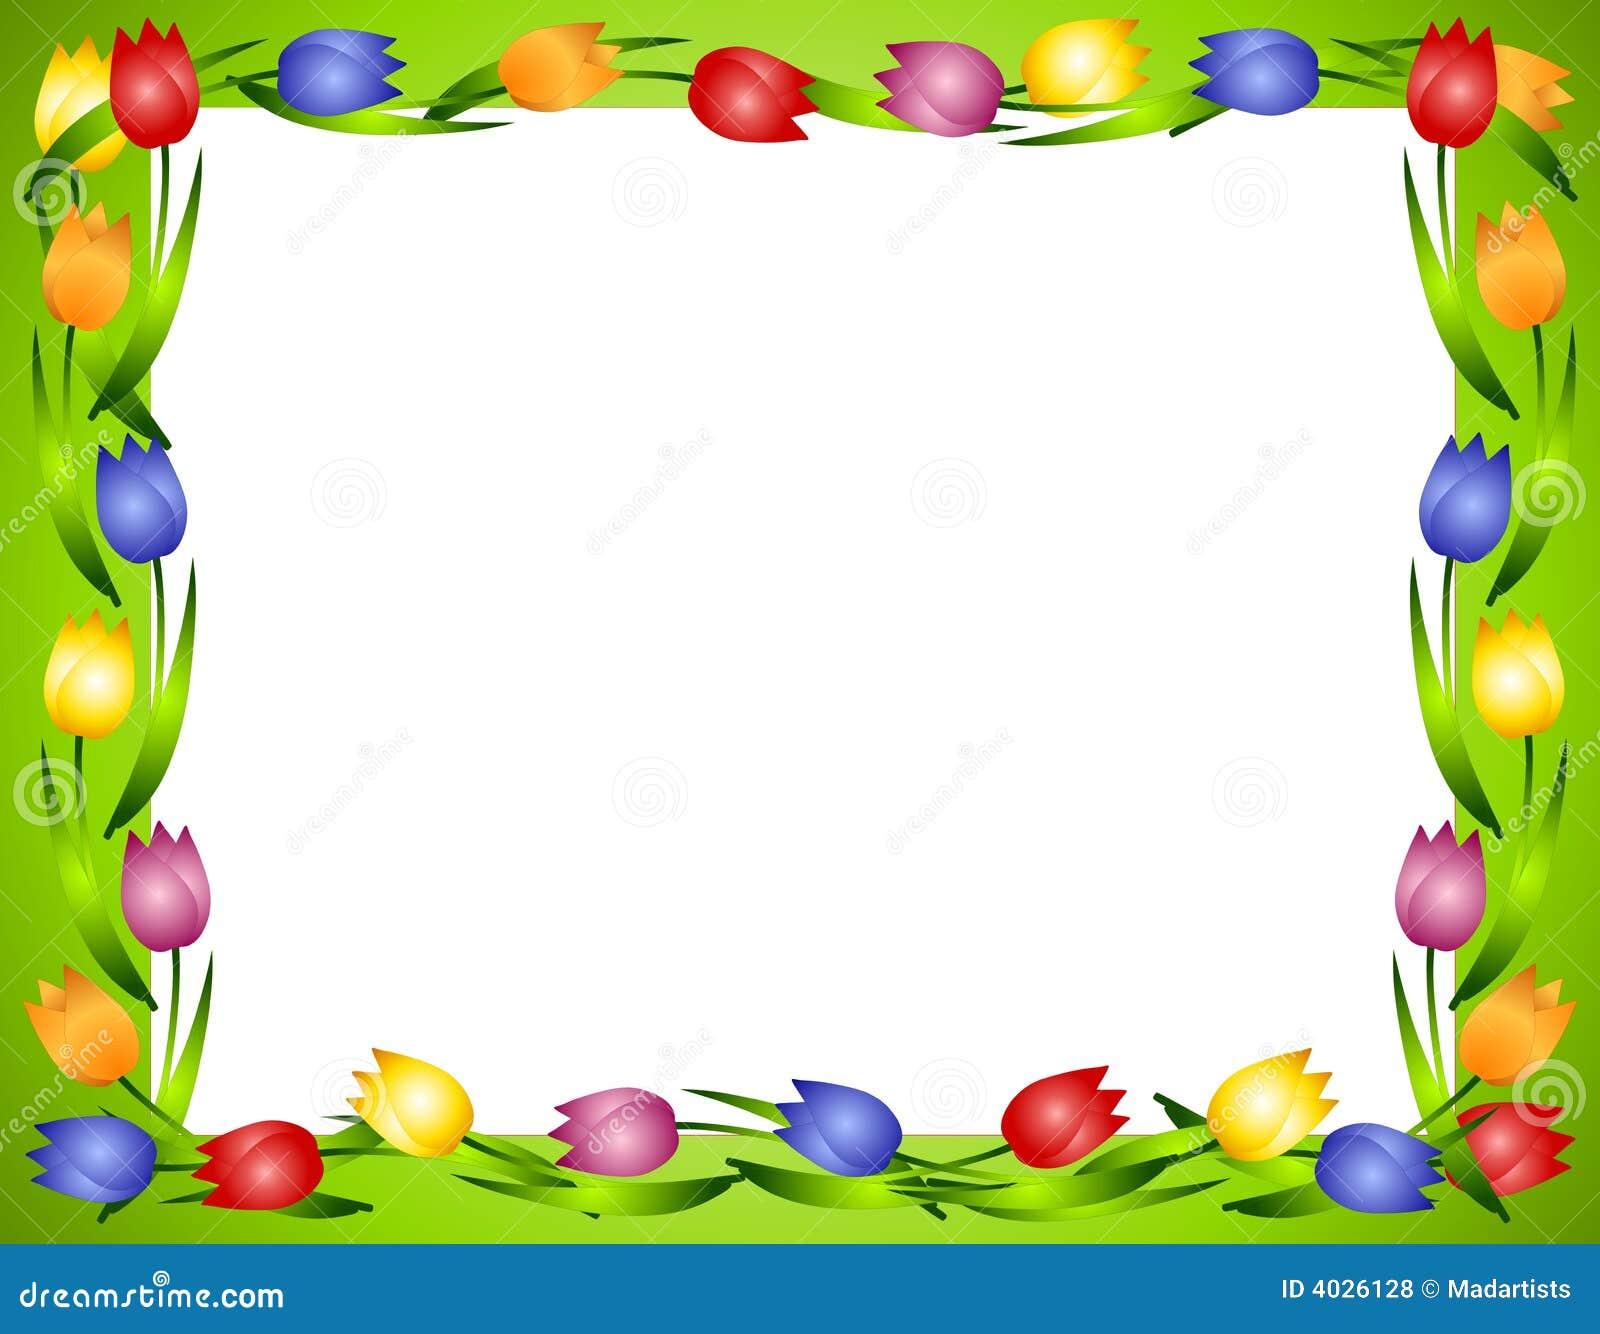 Spring Tulips Flower Frame Or Border 2 Royalty Free Stock ...